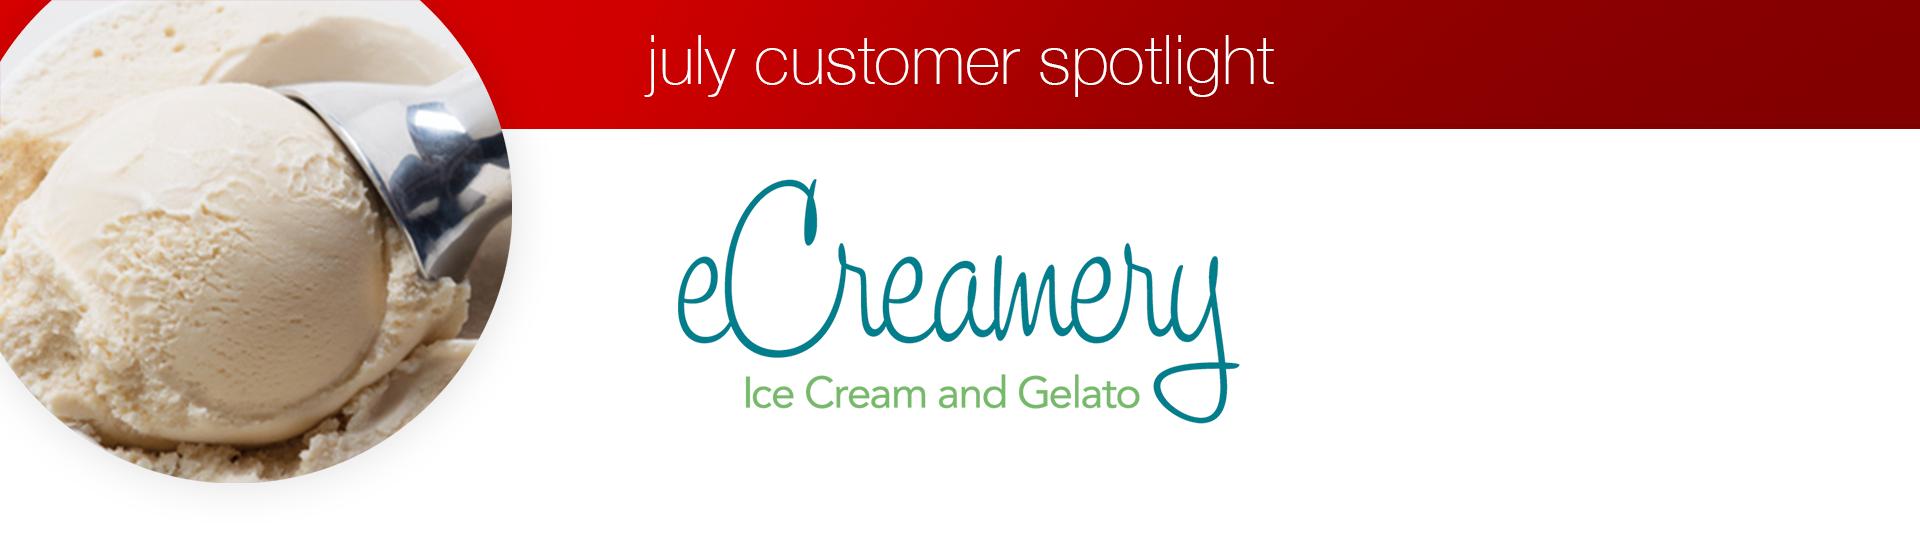 July Customer Spotlight - eCreamery